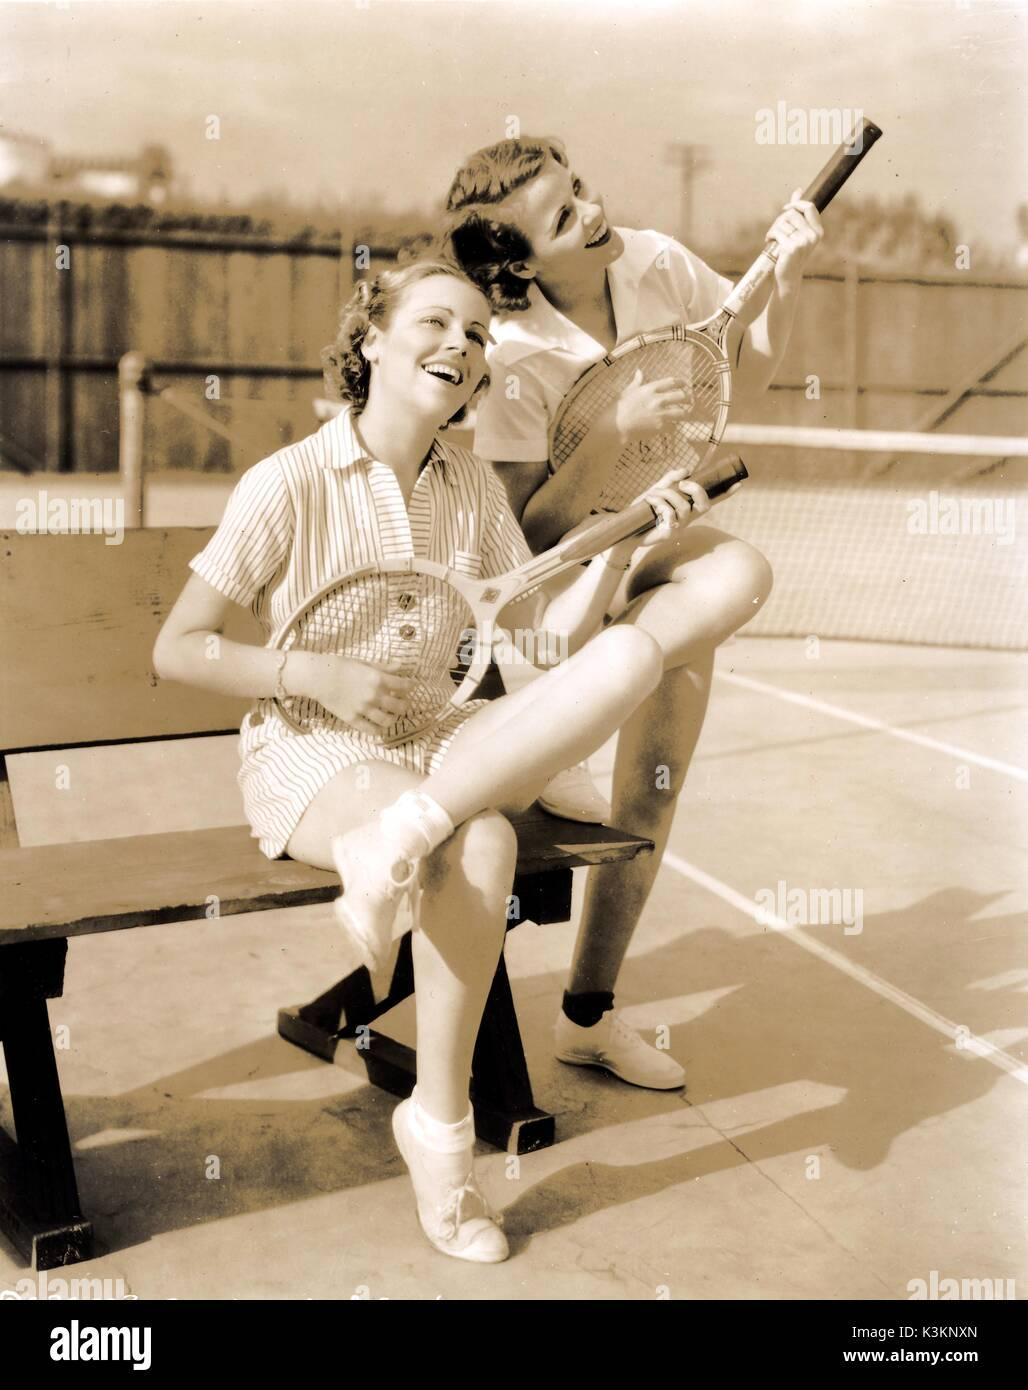 Left, GLORIA SHEA American actress , and BARBARA KENT Canadian-born Hollywood actress b1906, in a publicity shot 1930s - Stock Image